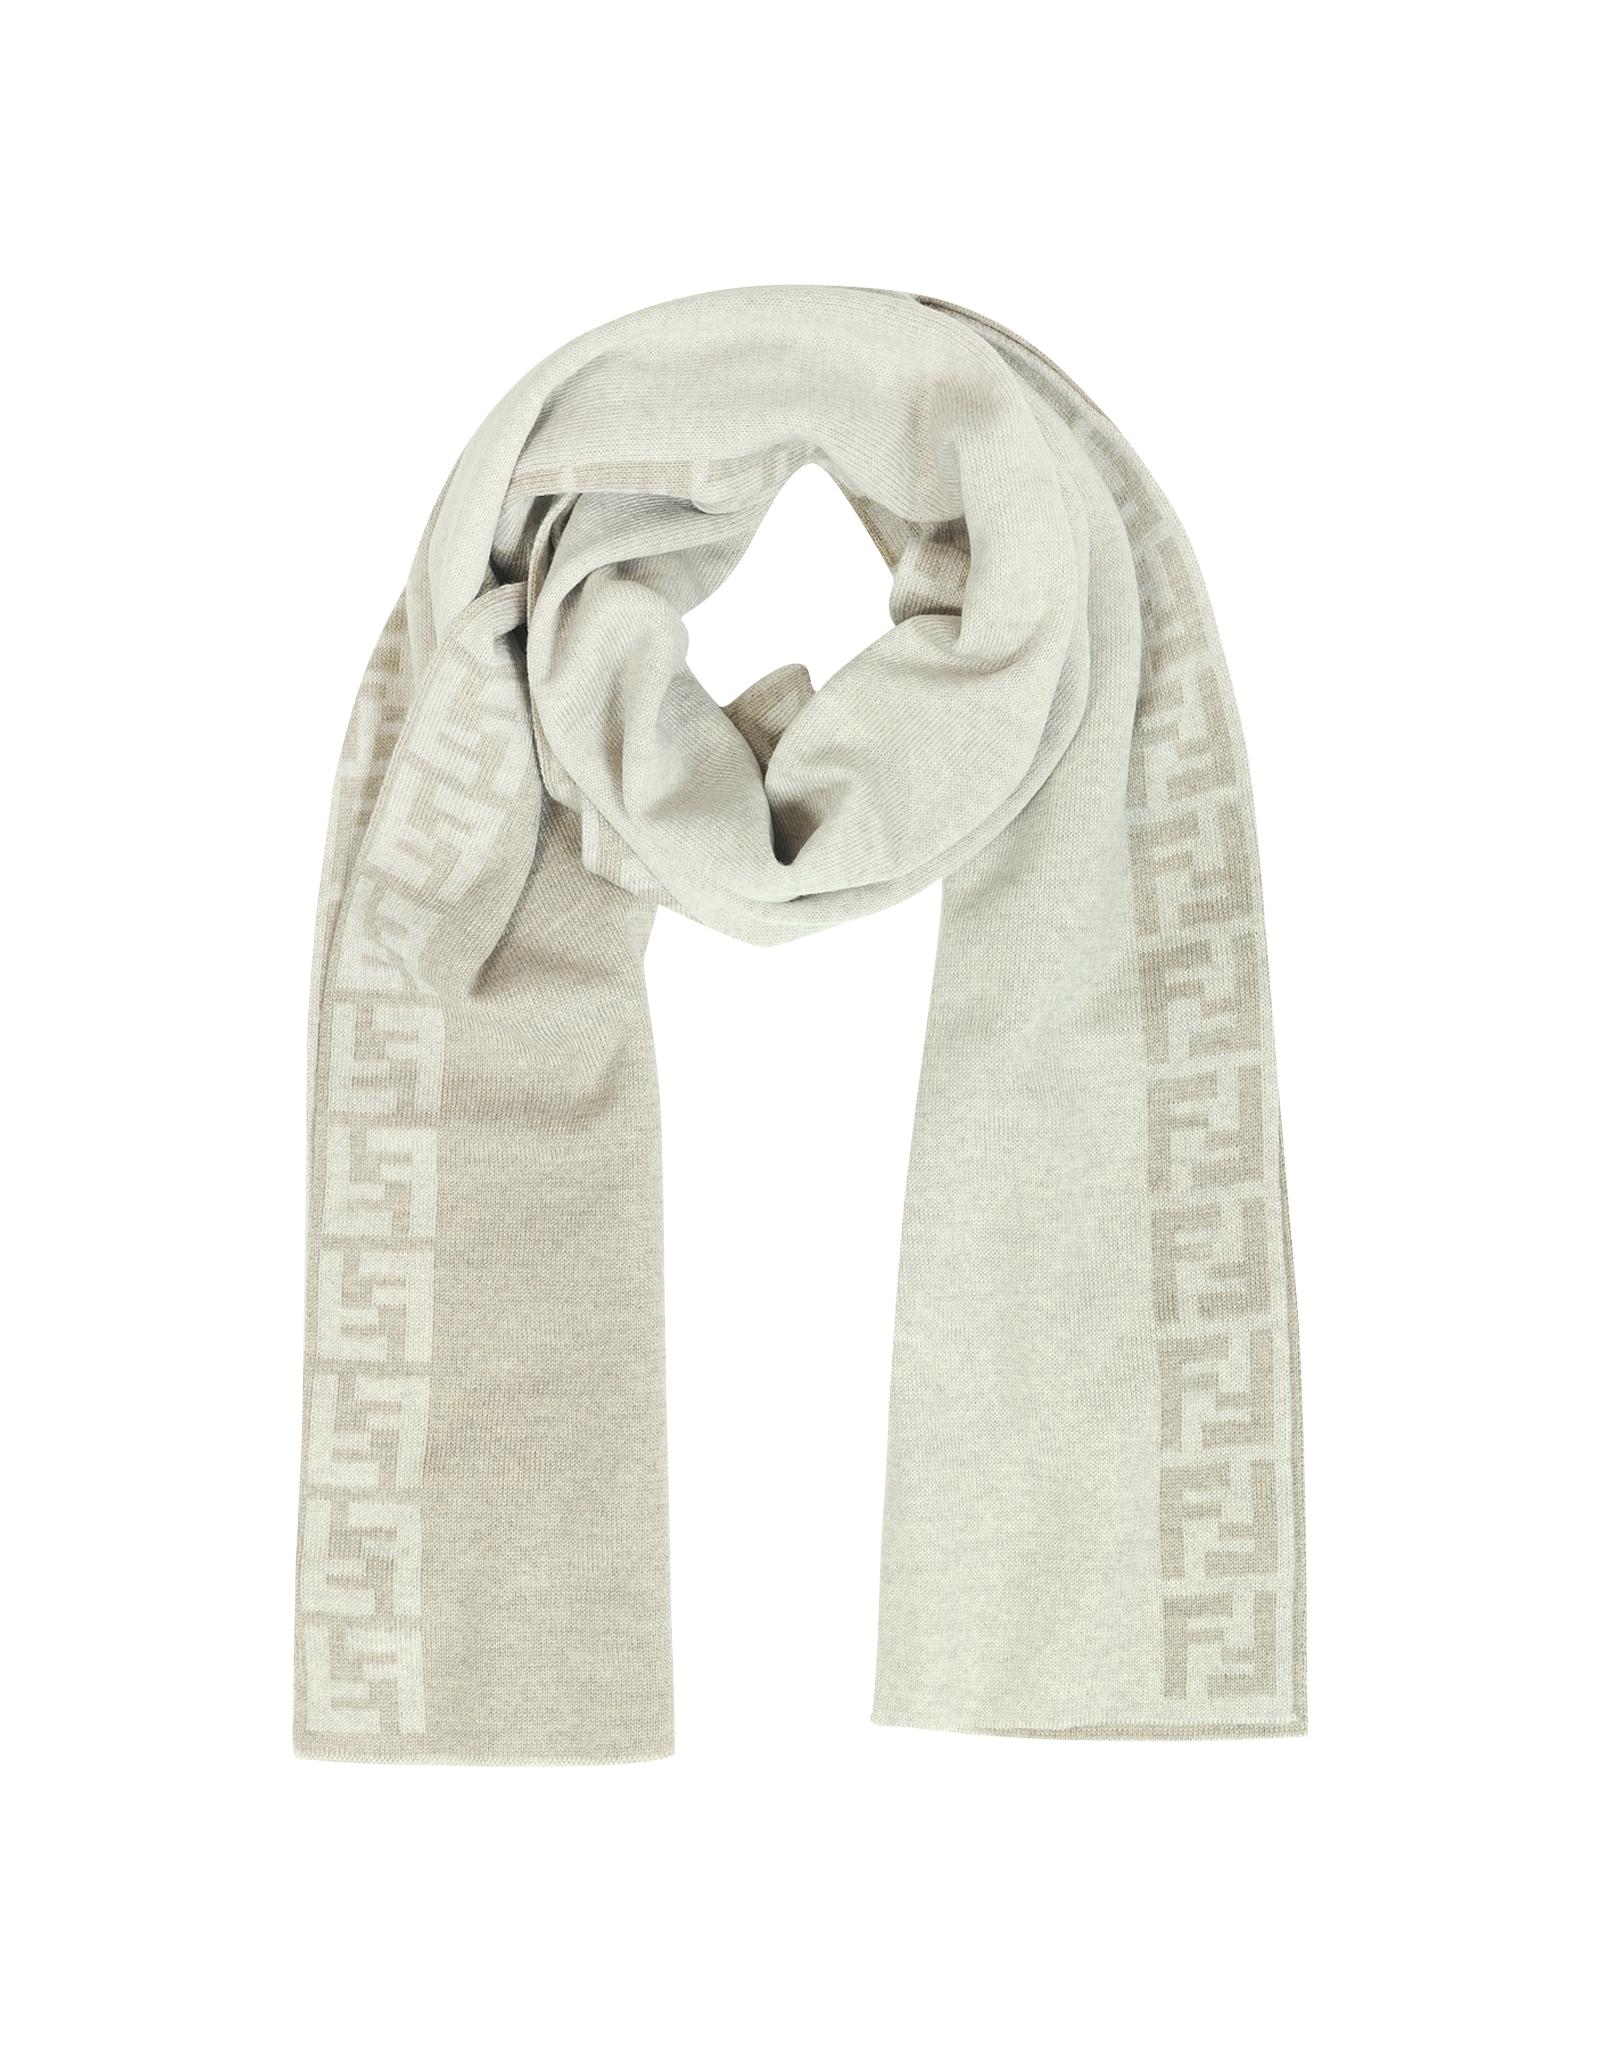 a95129266ff Lyst - Fendi Zucca Logo Ivory Wool Long Scarf in White